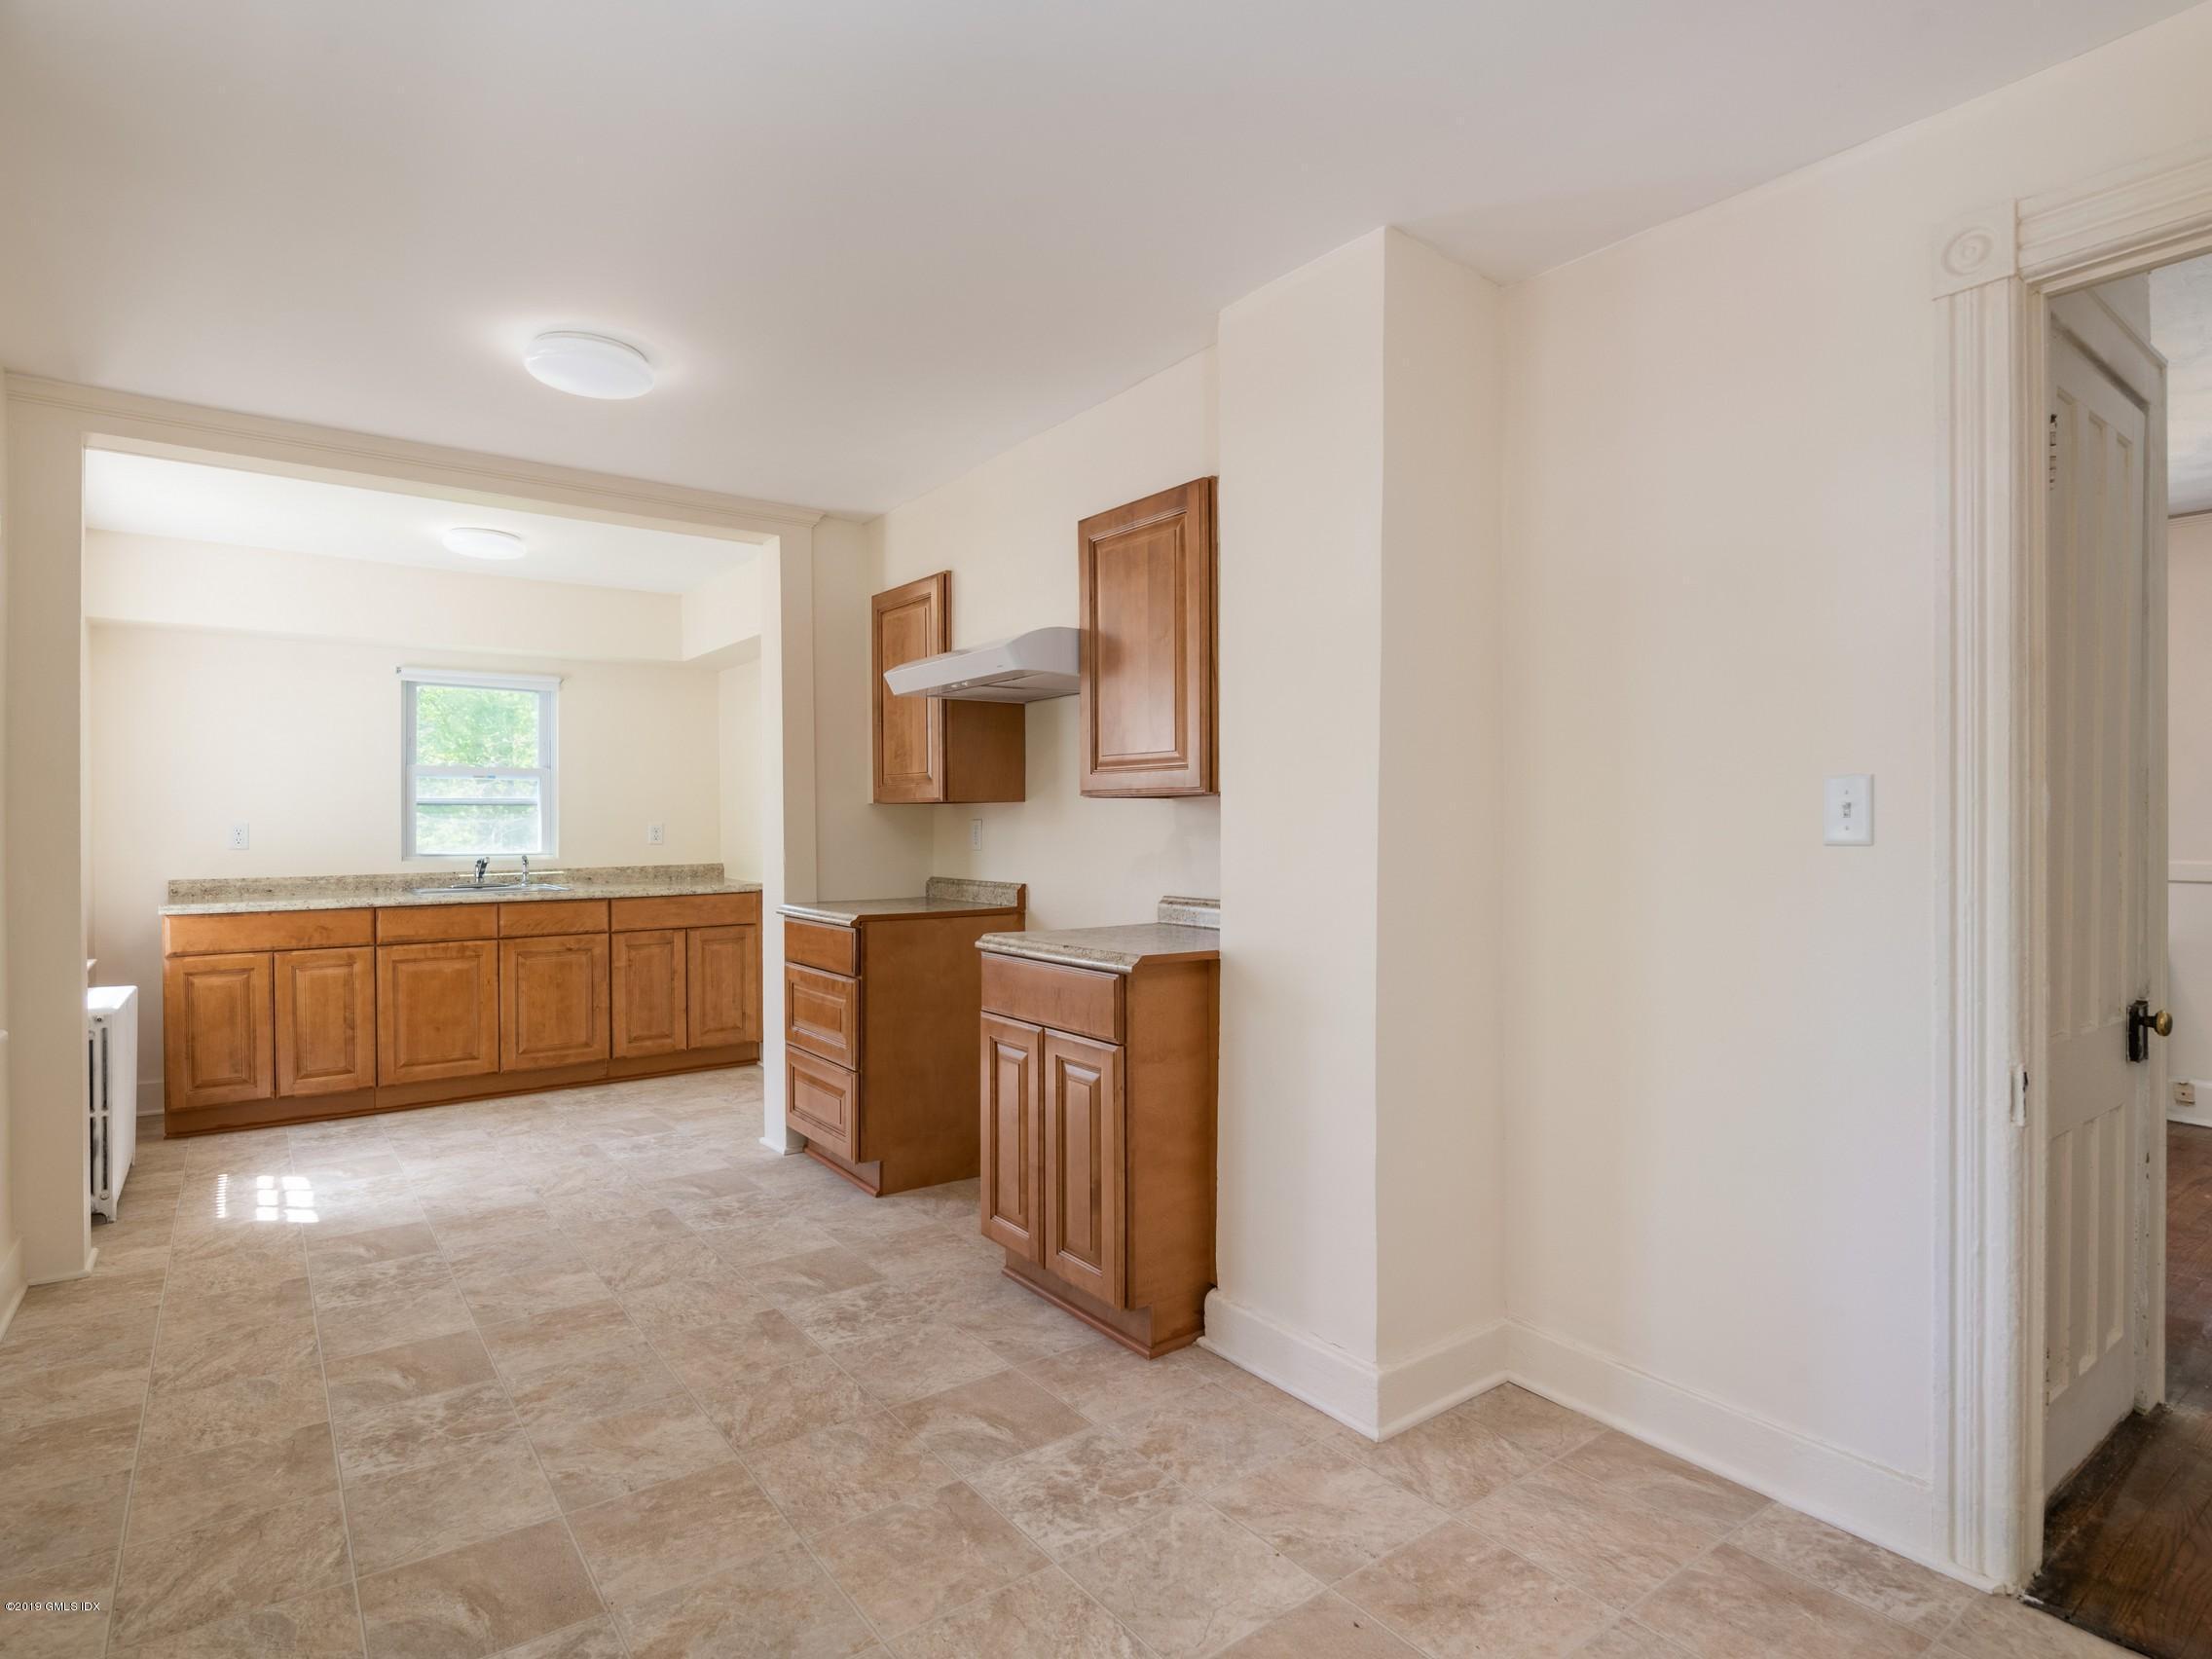 566 River Road,Cos Cob,Connecticut 06807,3 Bedrooms Bedrooms,1 BathroomBathrooms,Single family,River,106618